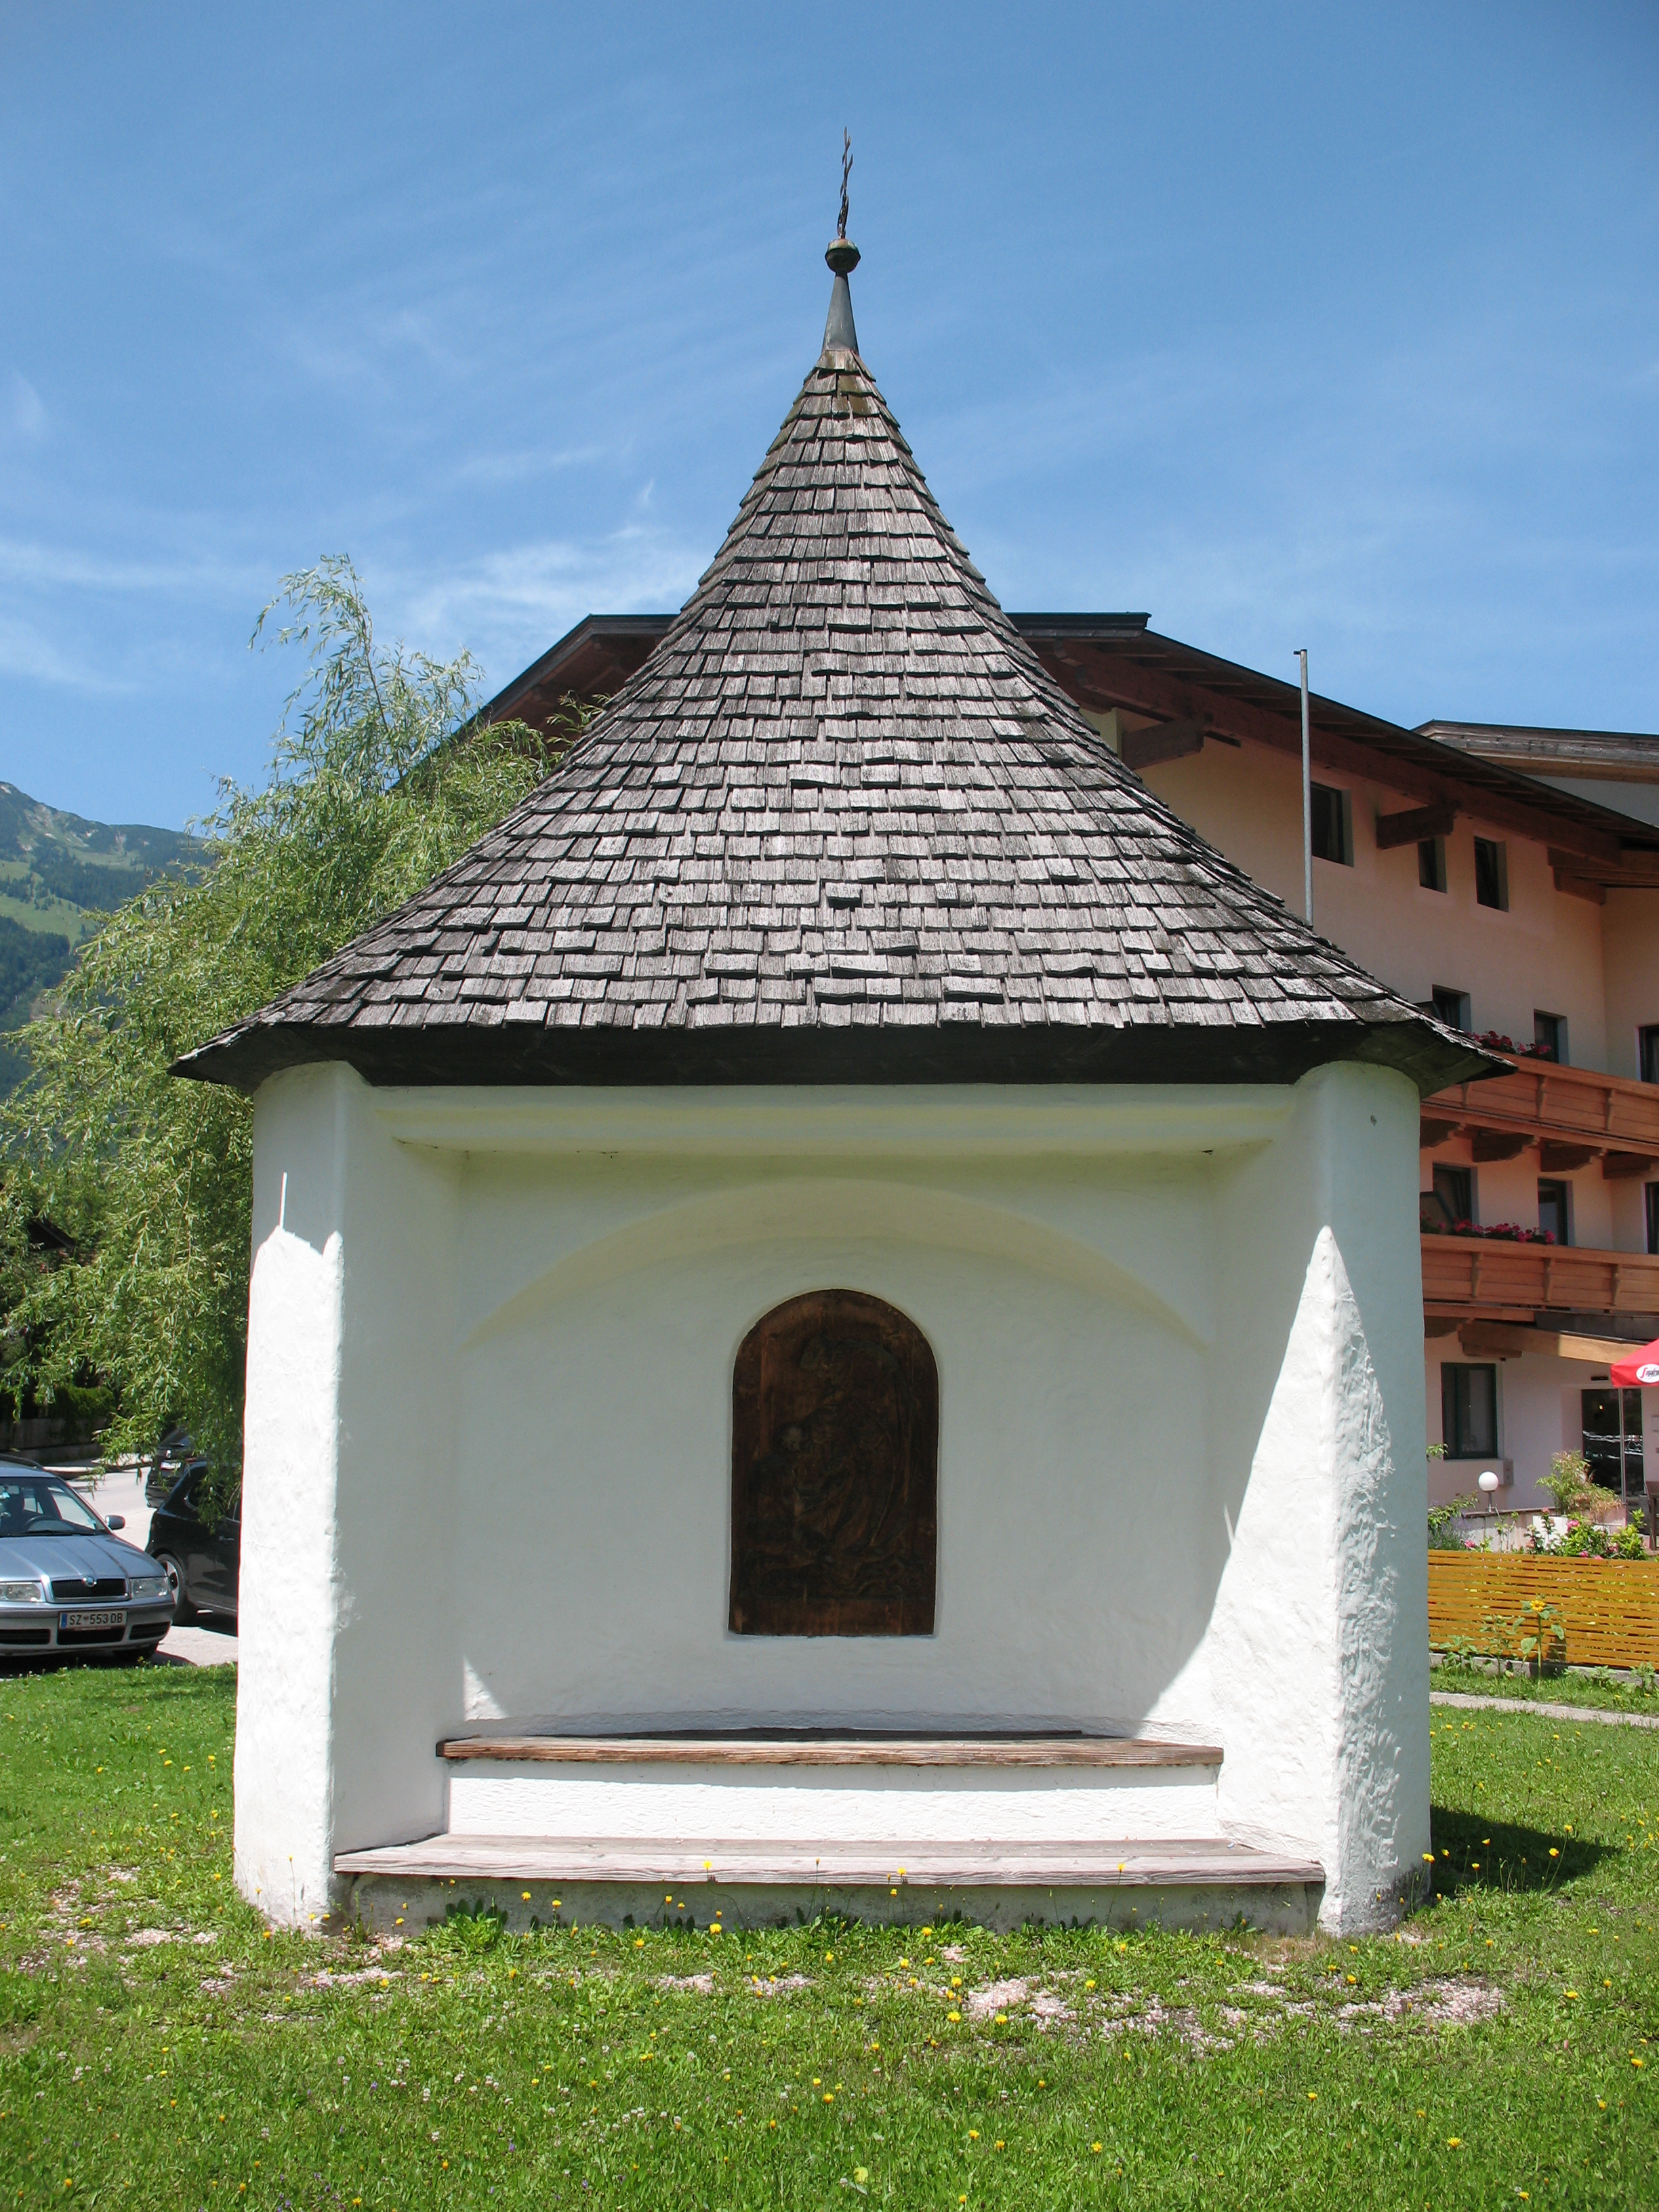 Kramsach - Tirol - rockmartonline.com